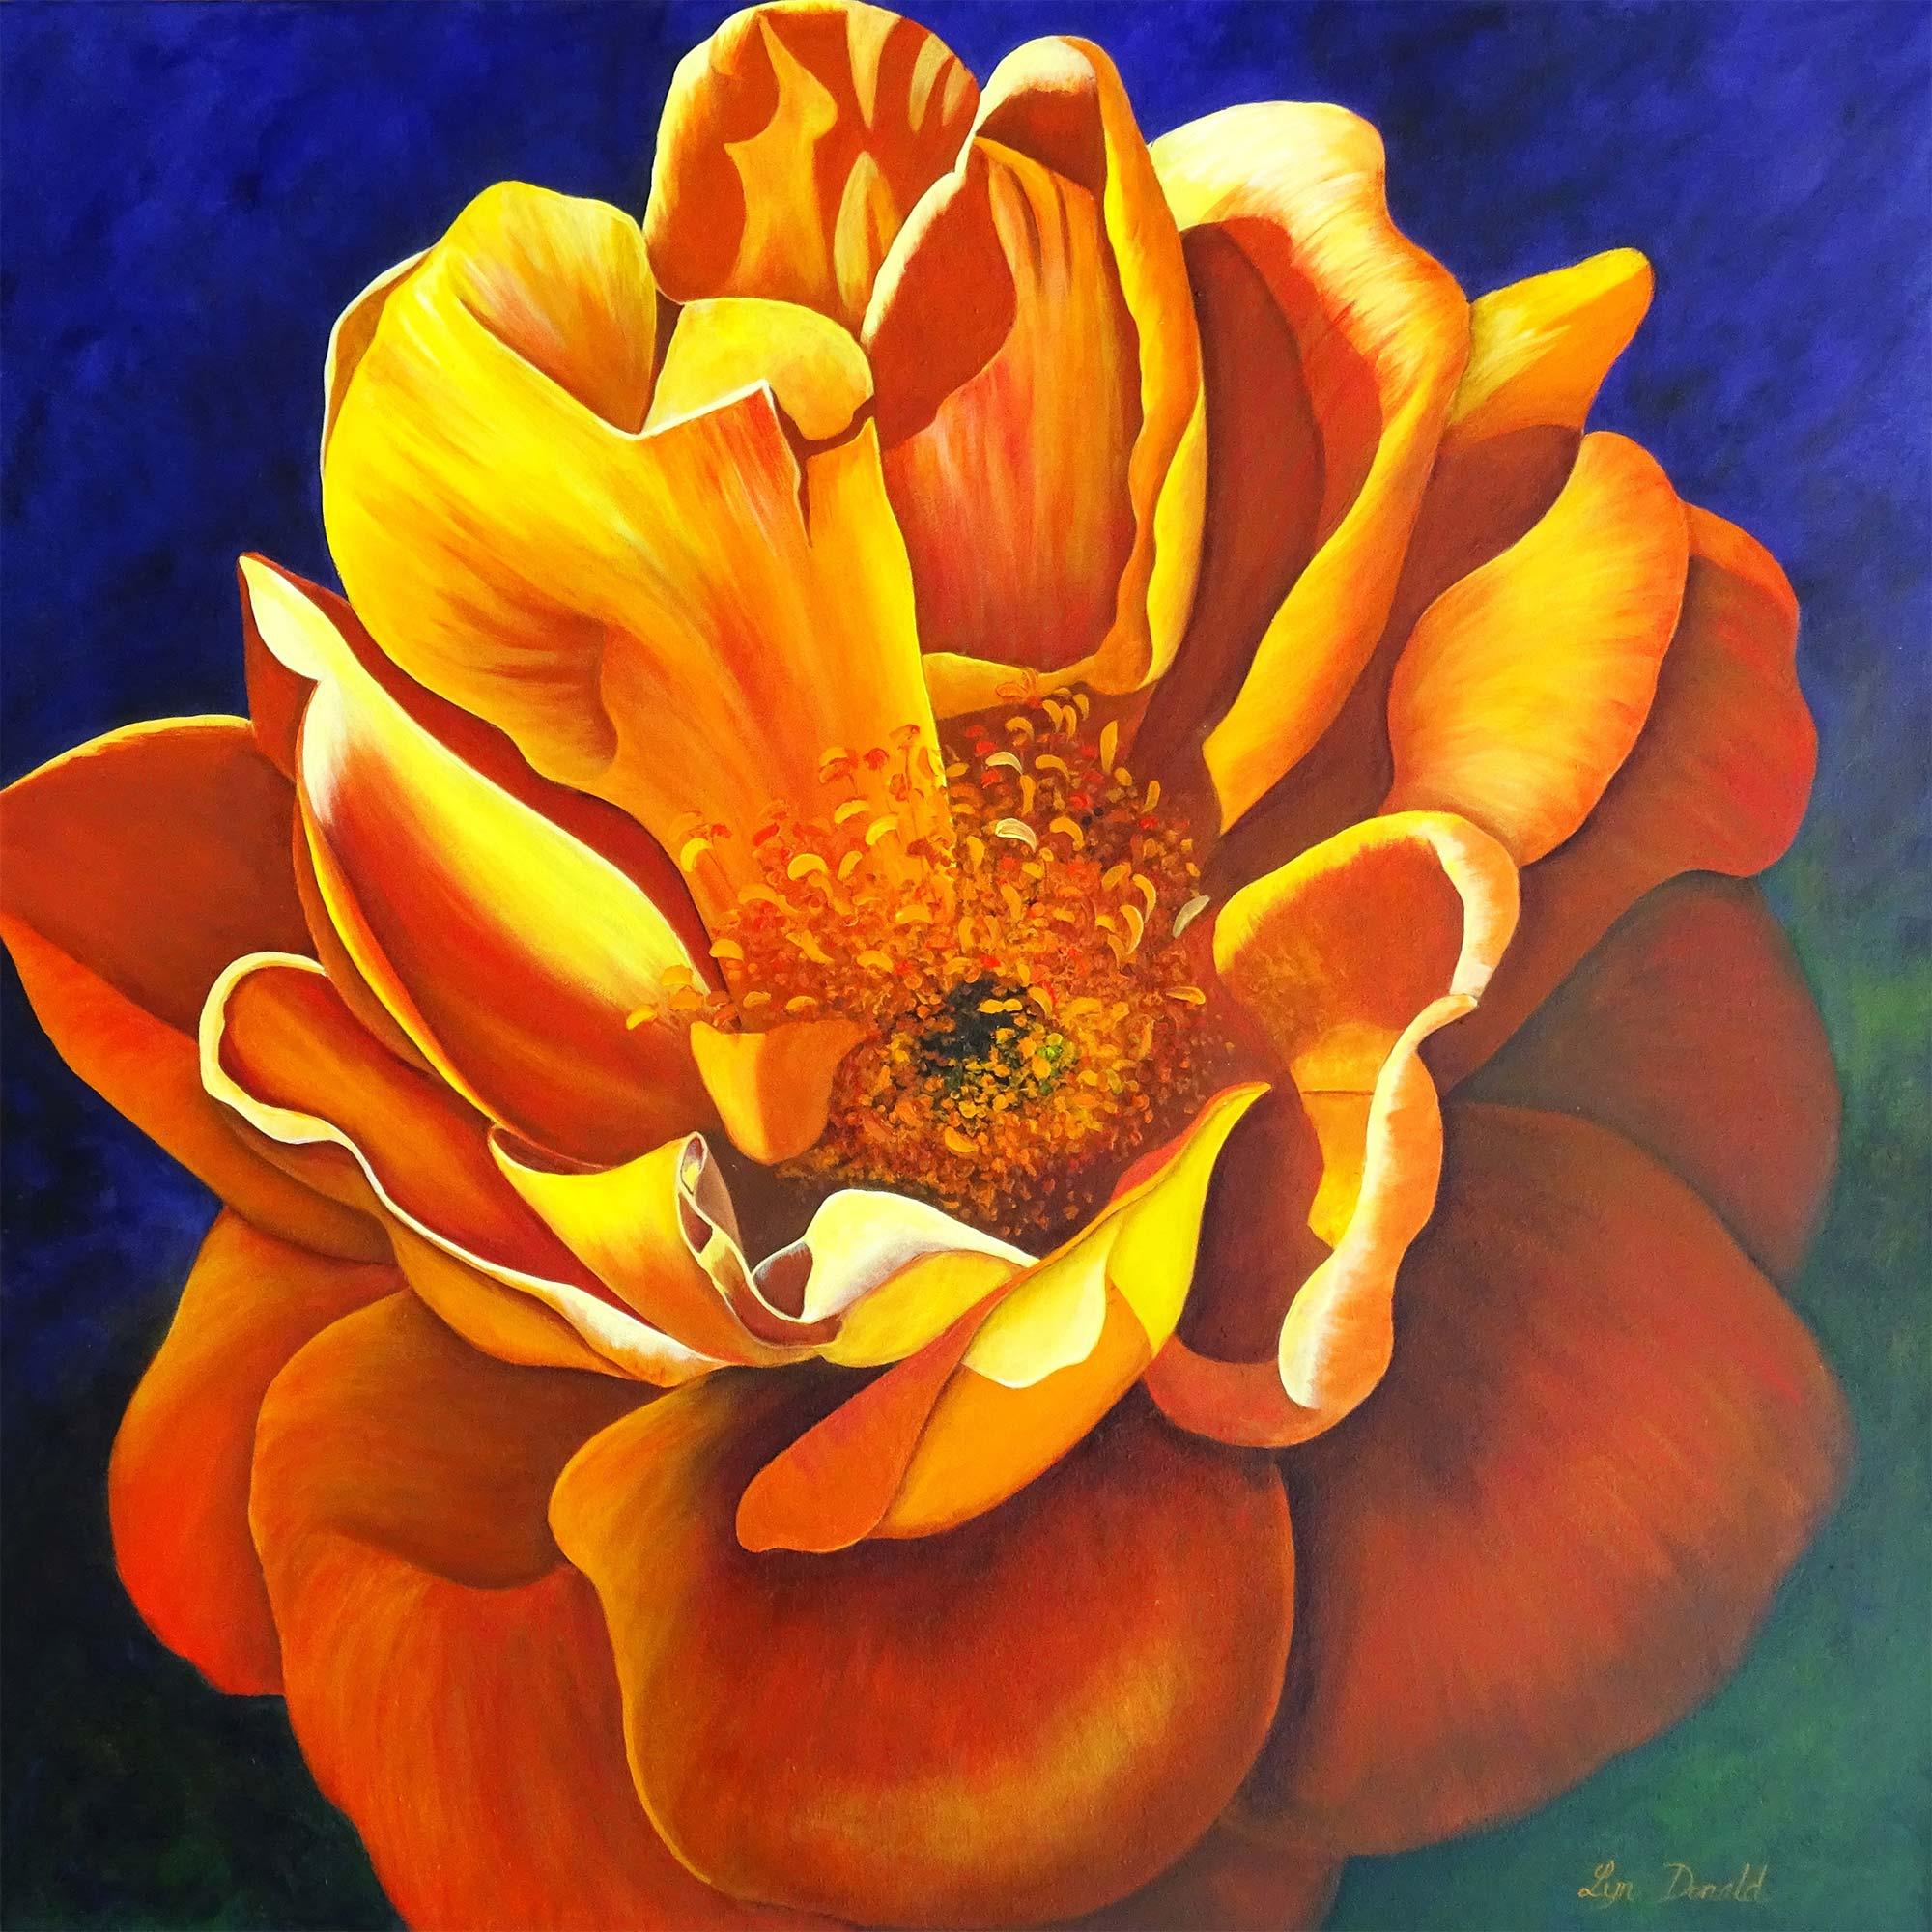 Lyn Donald - Art Teacher - Woburn Abbey's Firey Passion